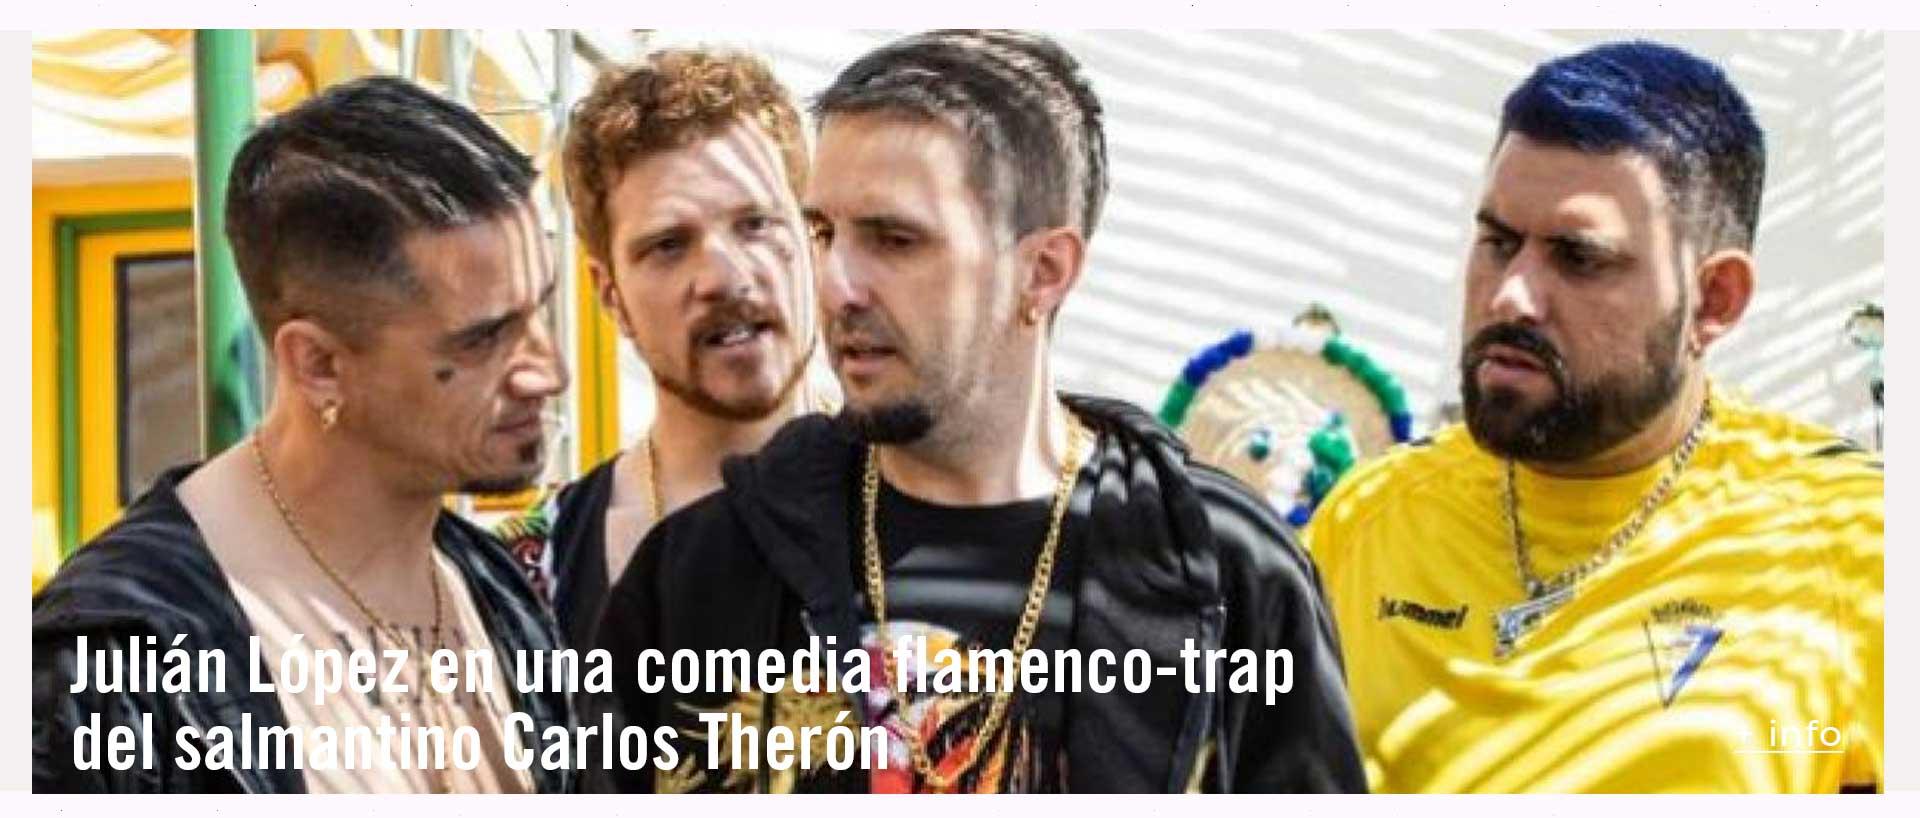 camaron_news.jpg